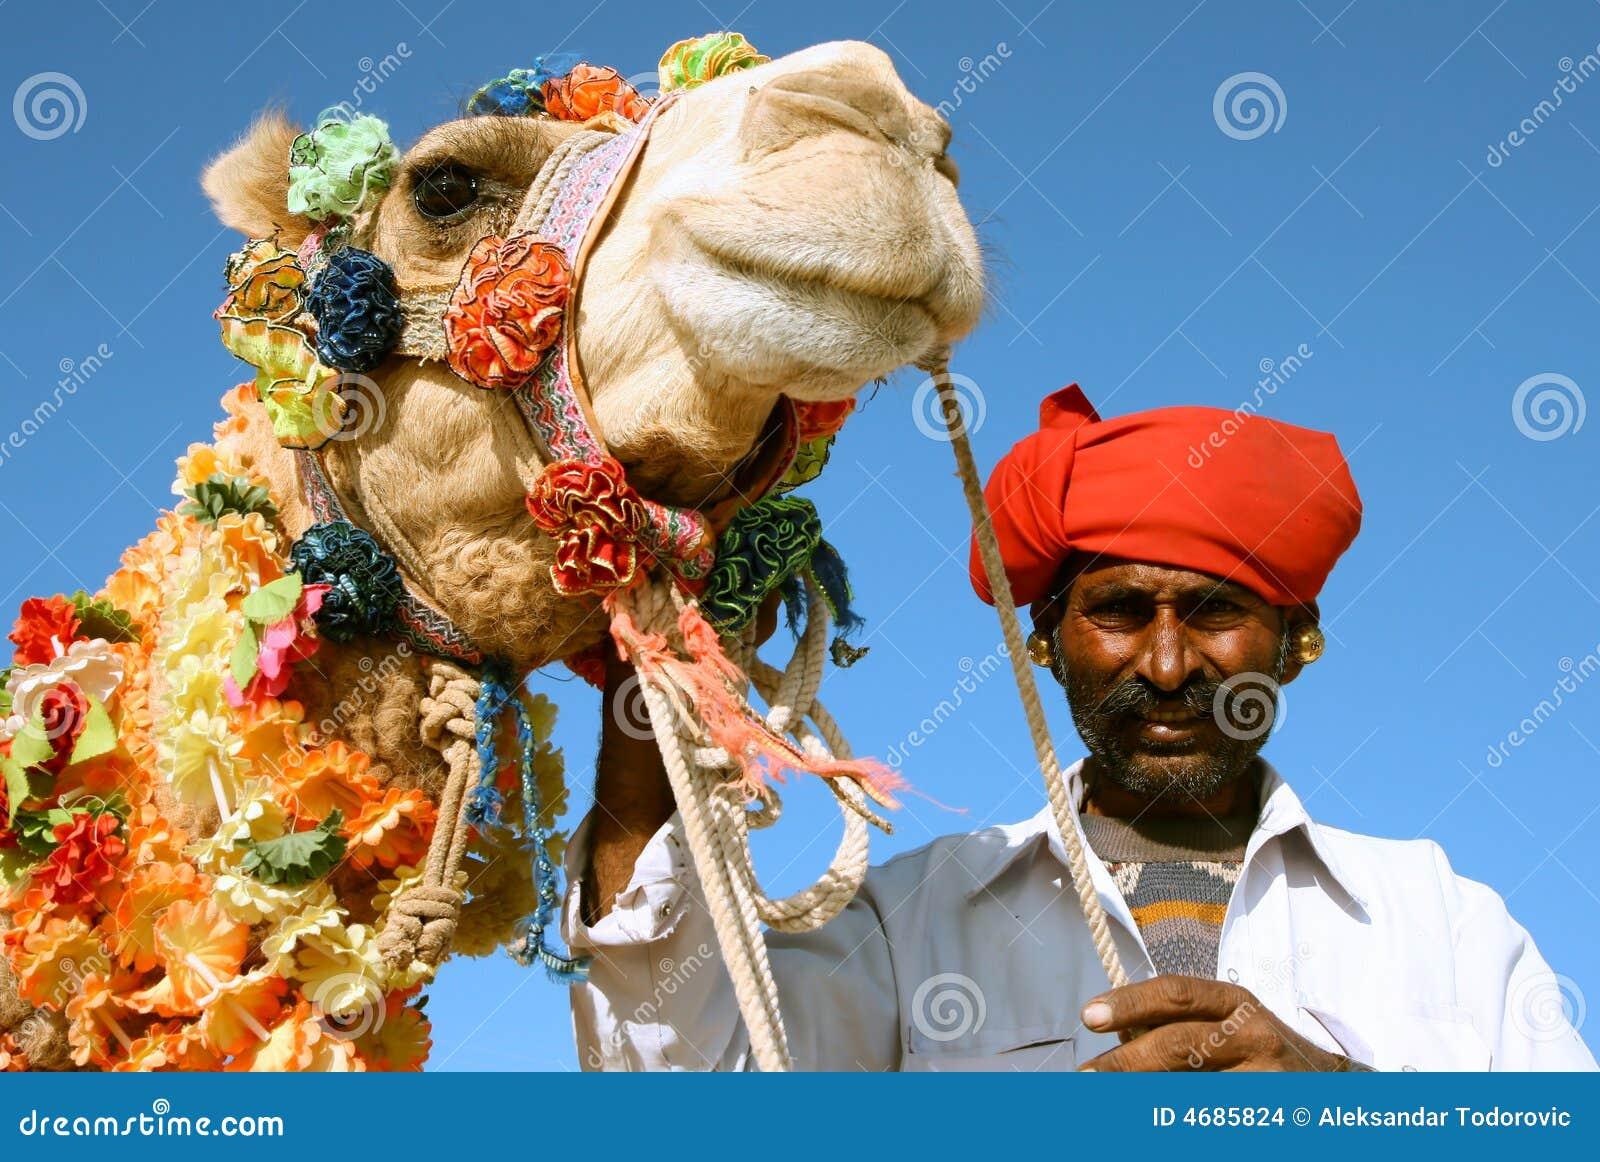 Camel on safari